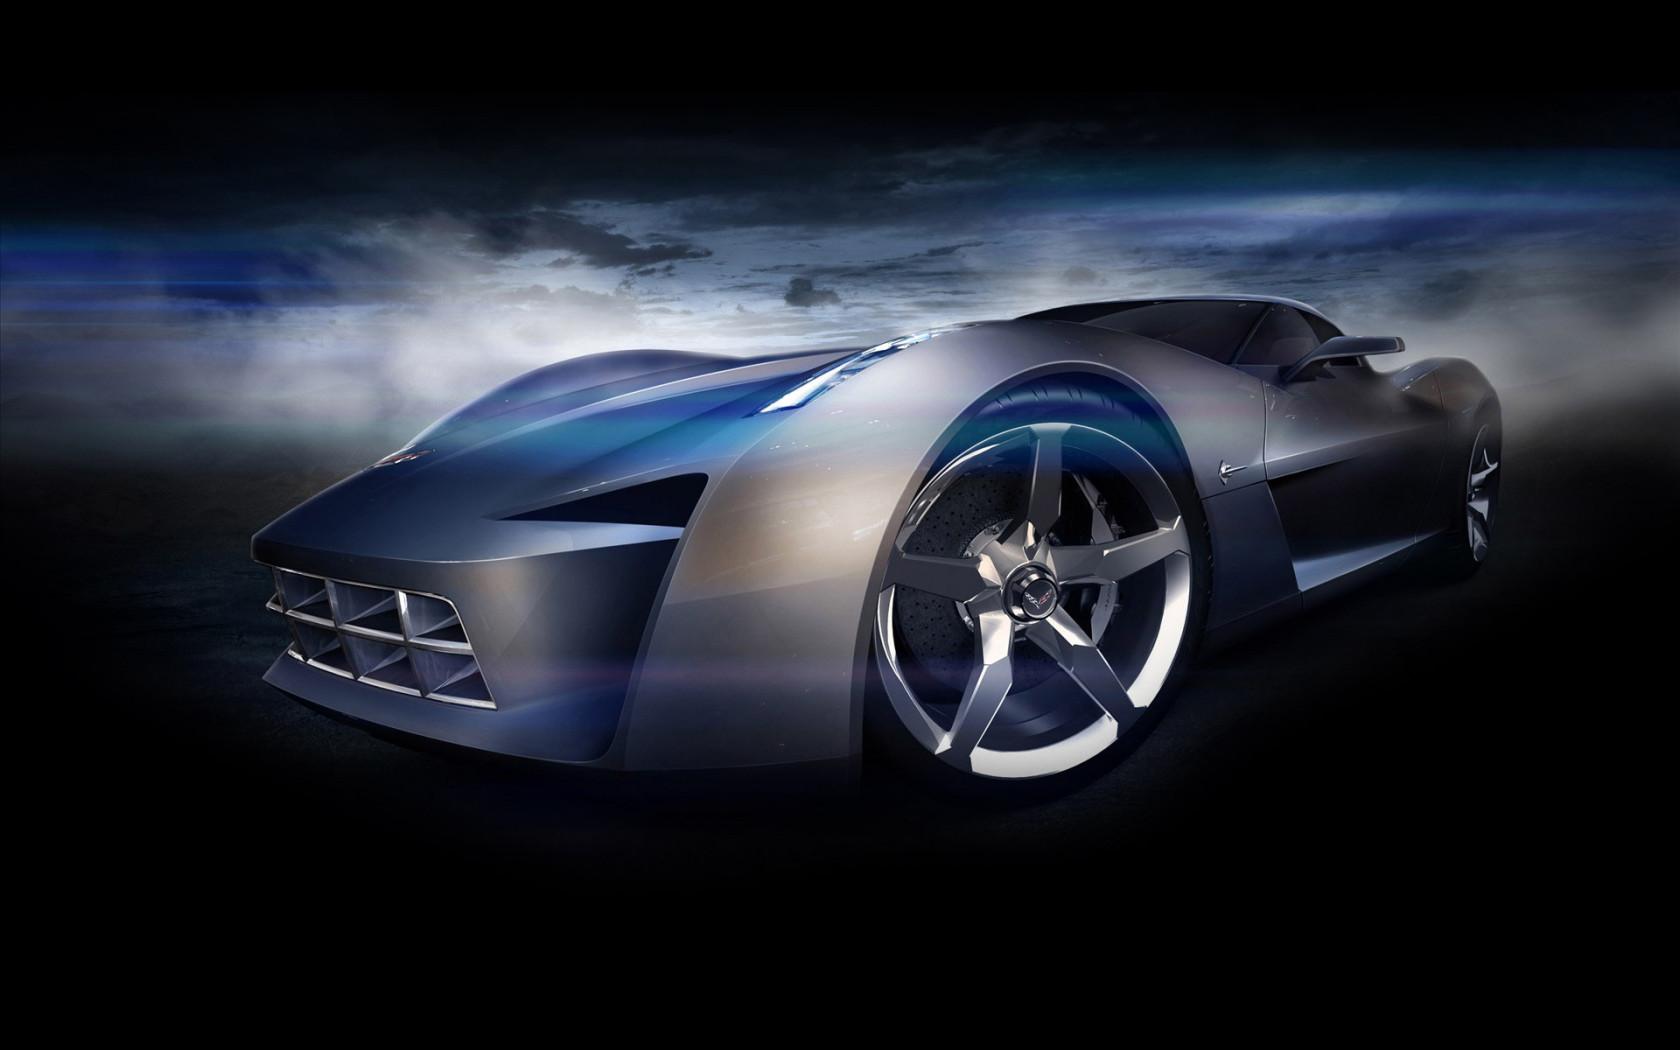 Beautiful sports car Desktop wallpapers 1680x1050 1680x1050